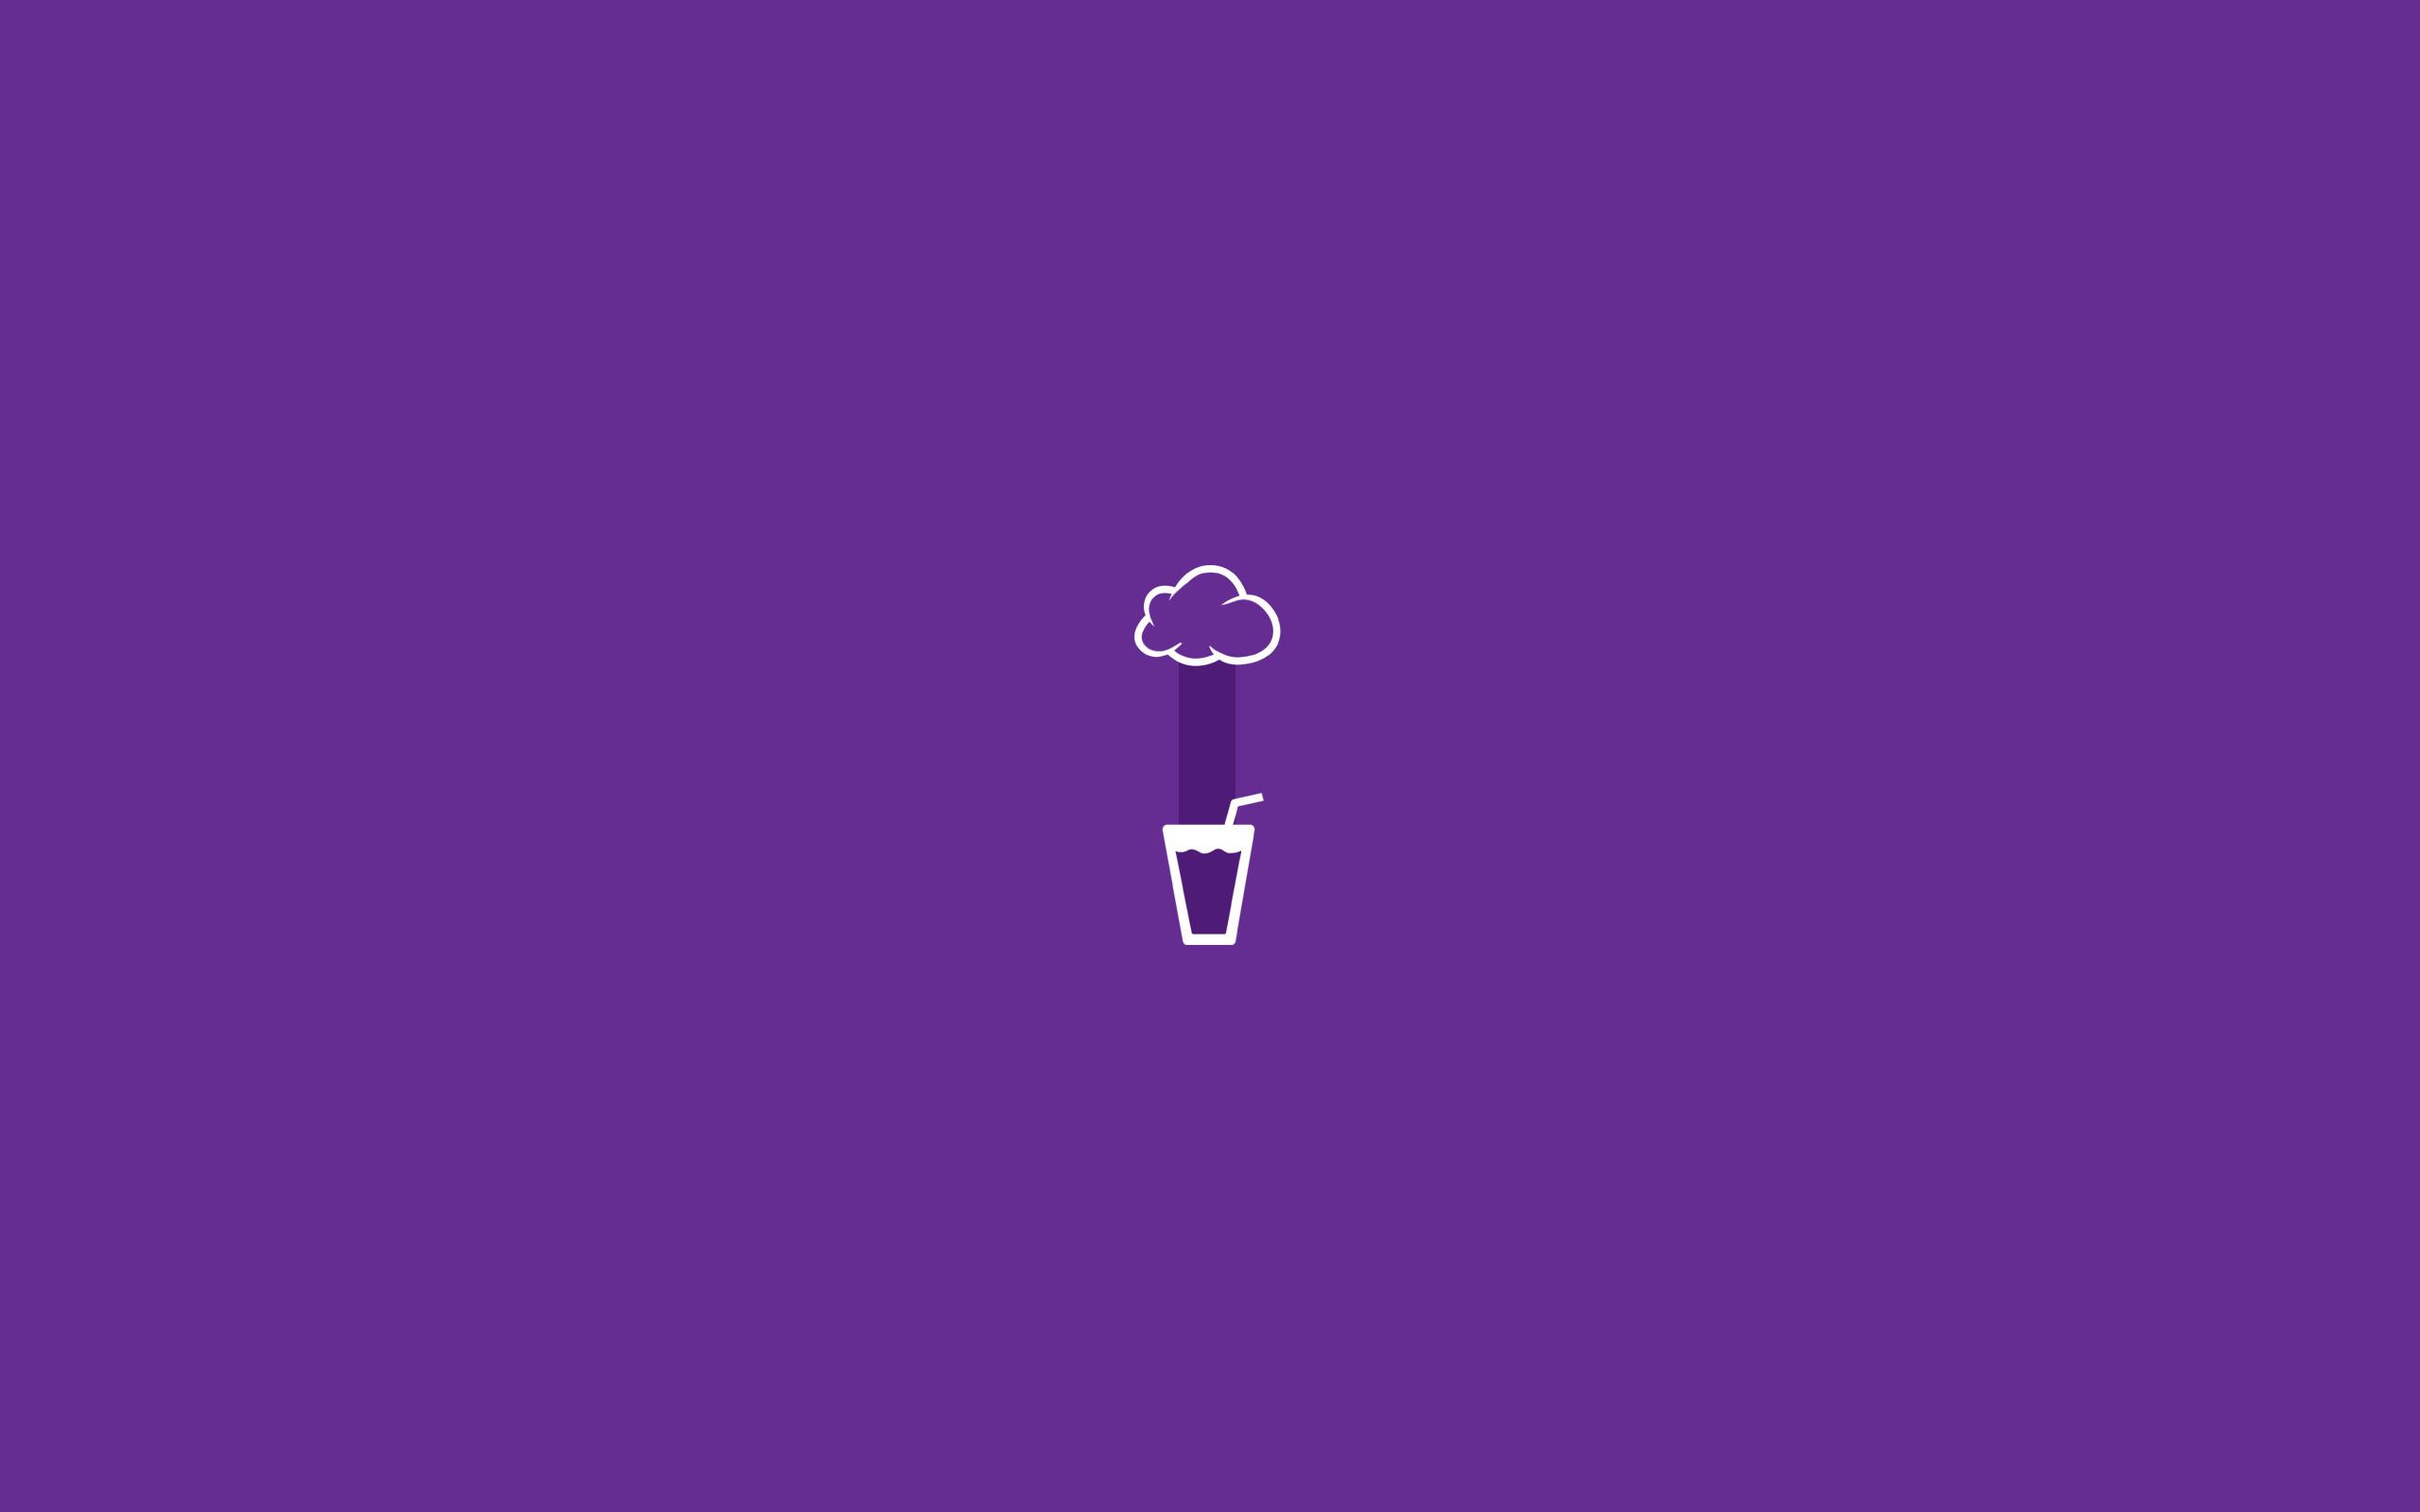 Res: 2560x1600, Glass rain minimalist wallpaper violet